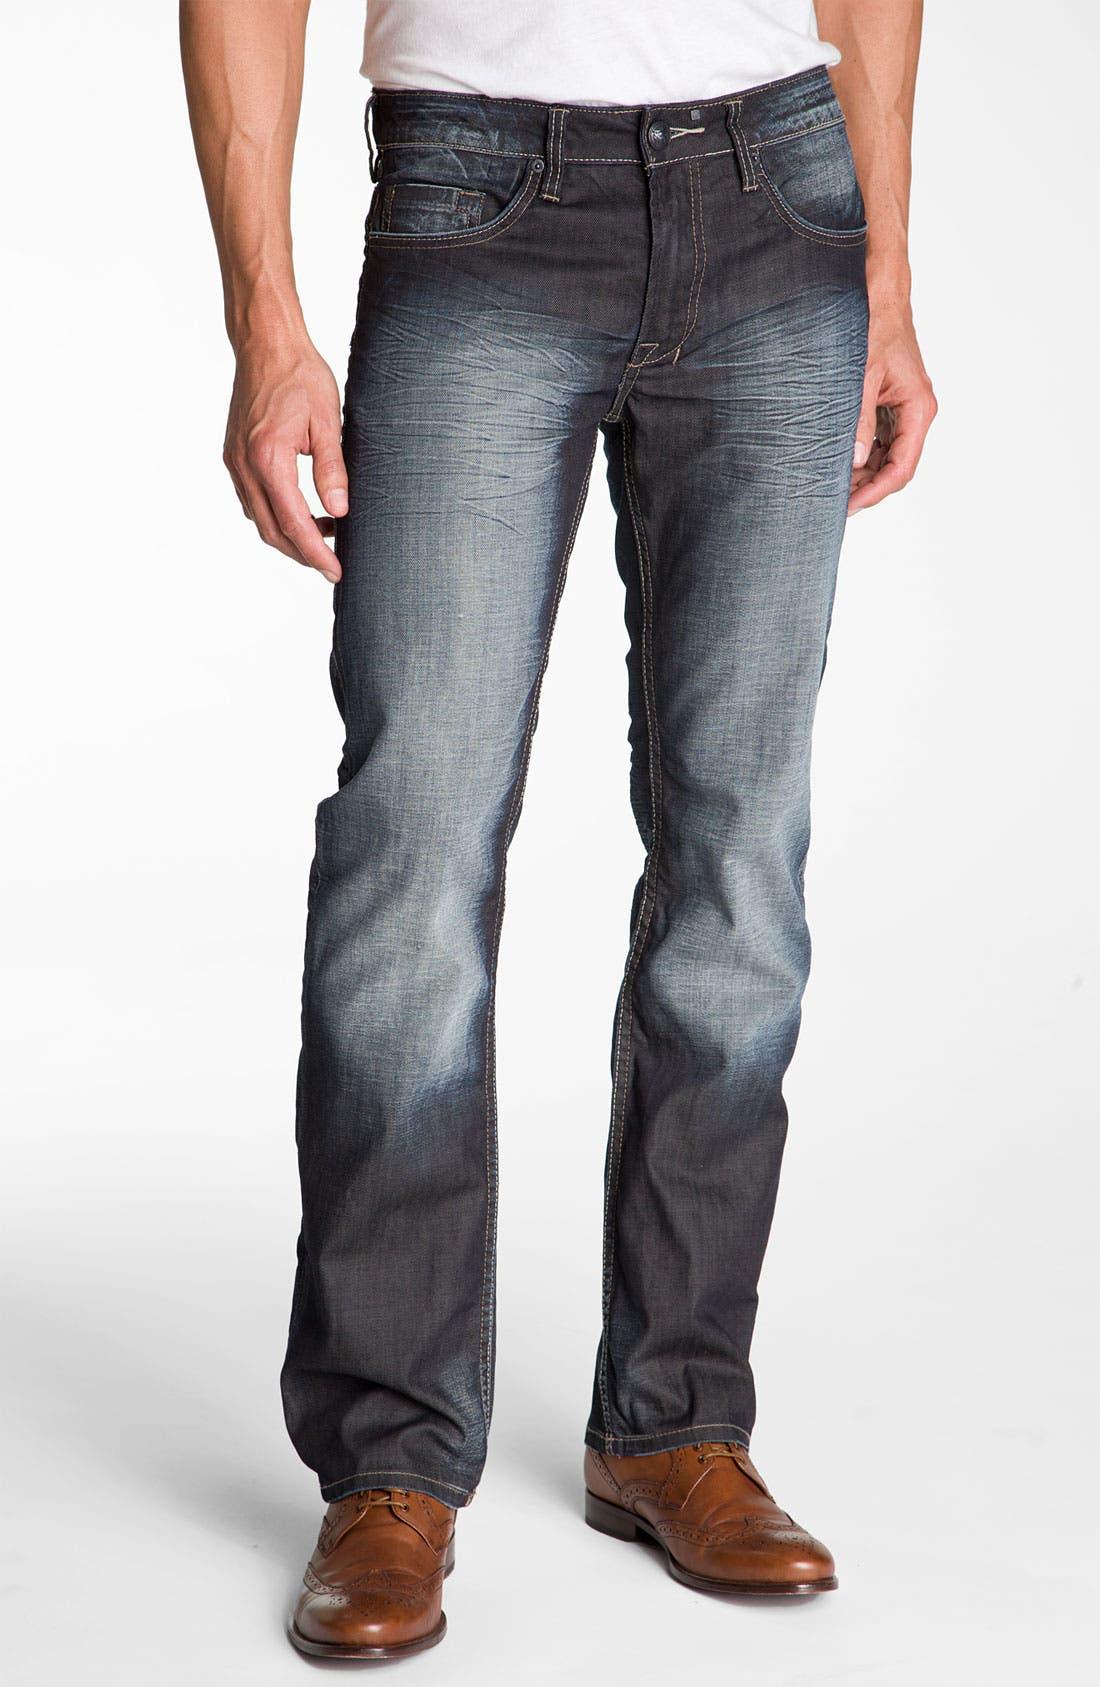 Alternate Image 1 Selected - Buffalo Jeans 'Six' Slim Straight Leg Jeans (Vintage Stone)